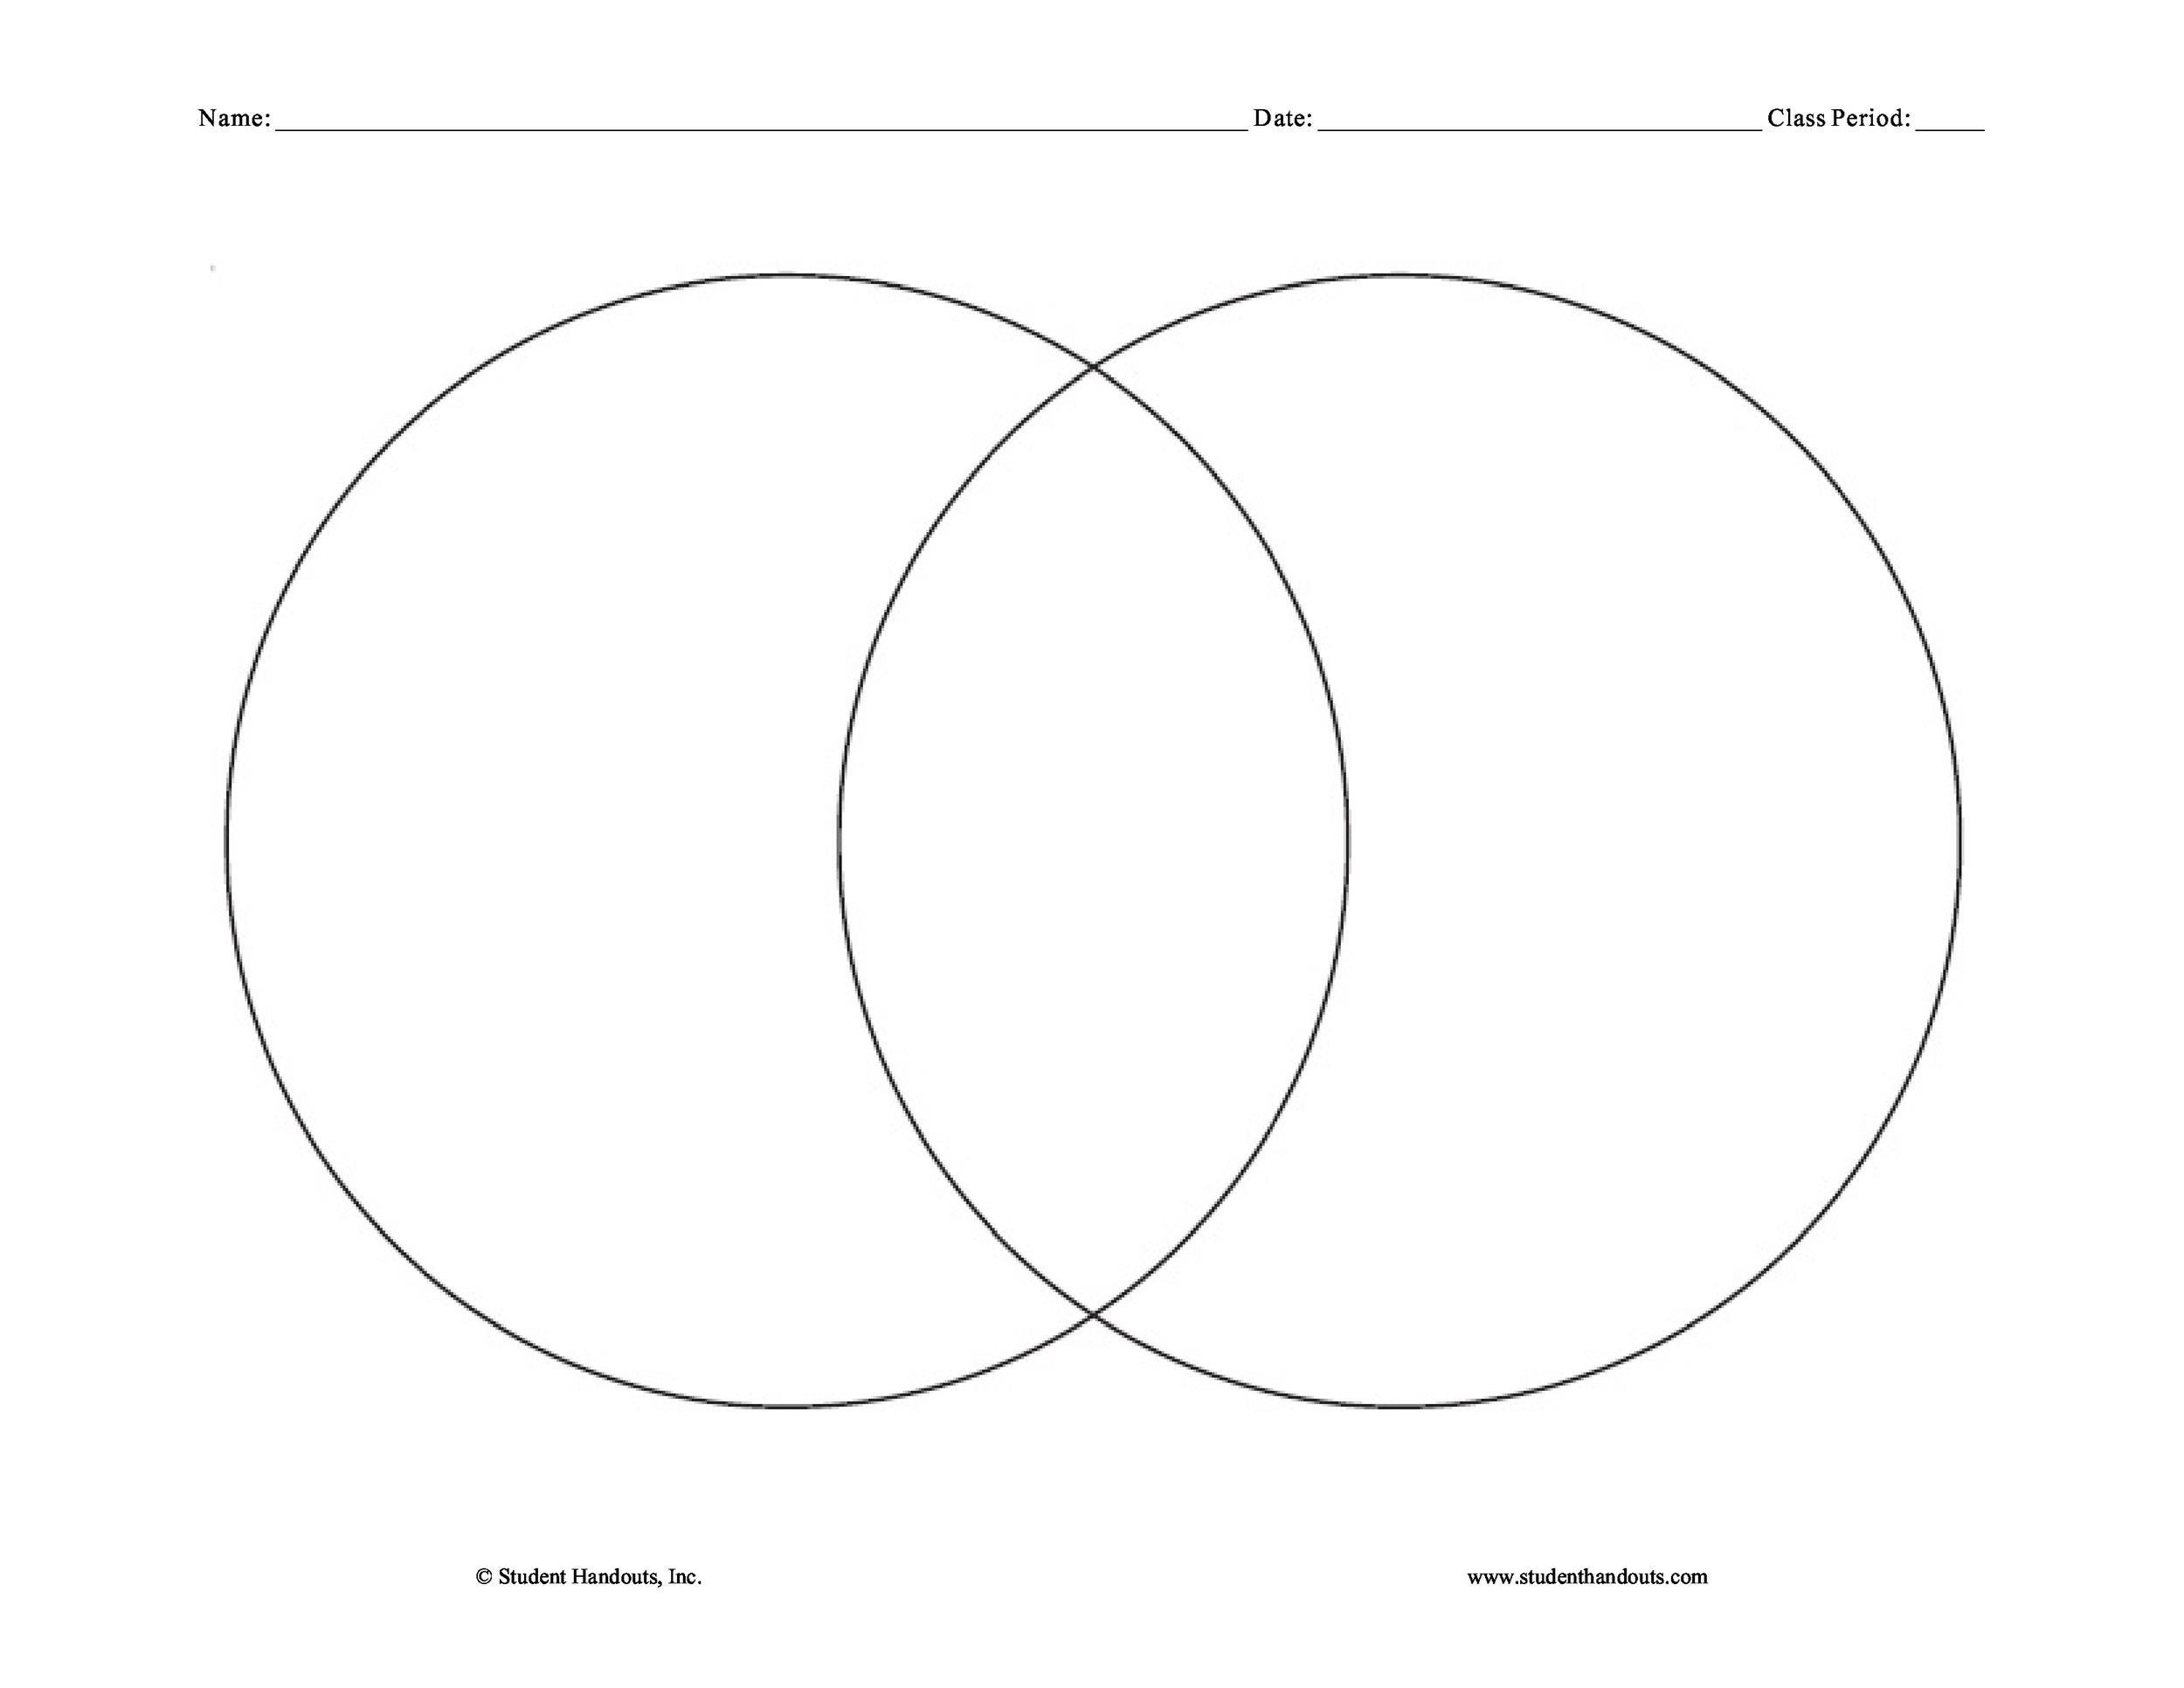 Wiring Diagram Database: How To Draw Venn Diagram In Word